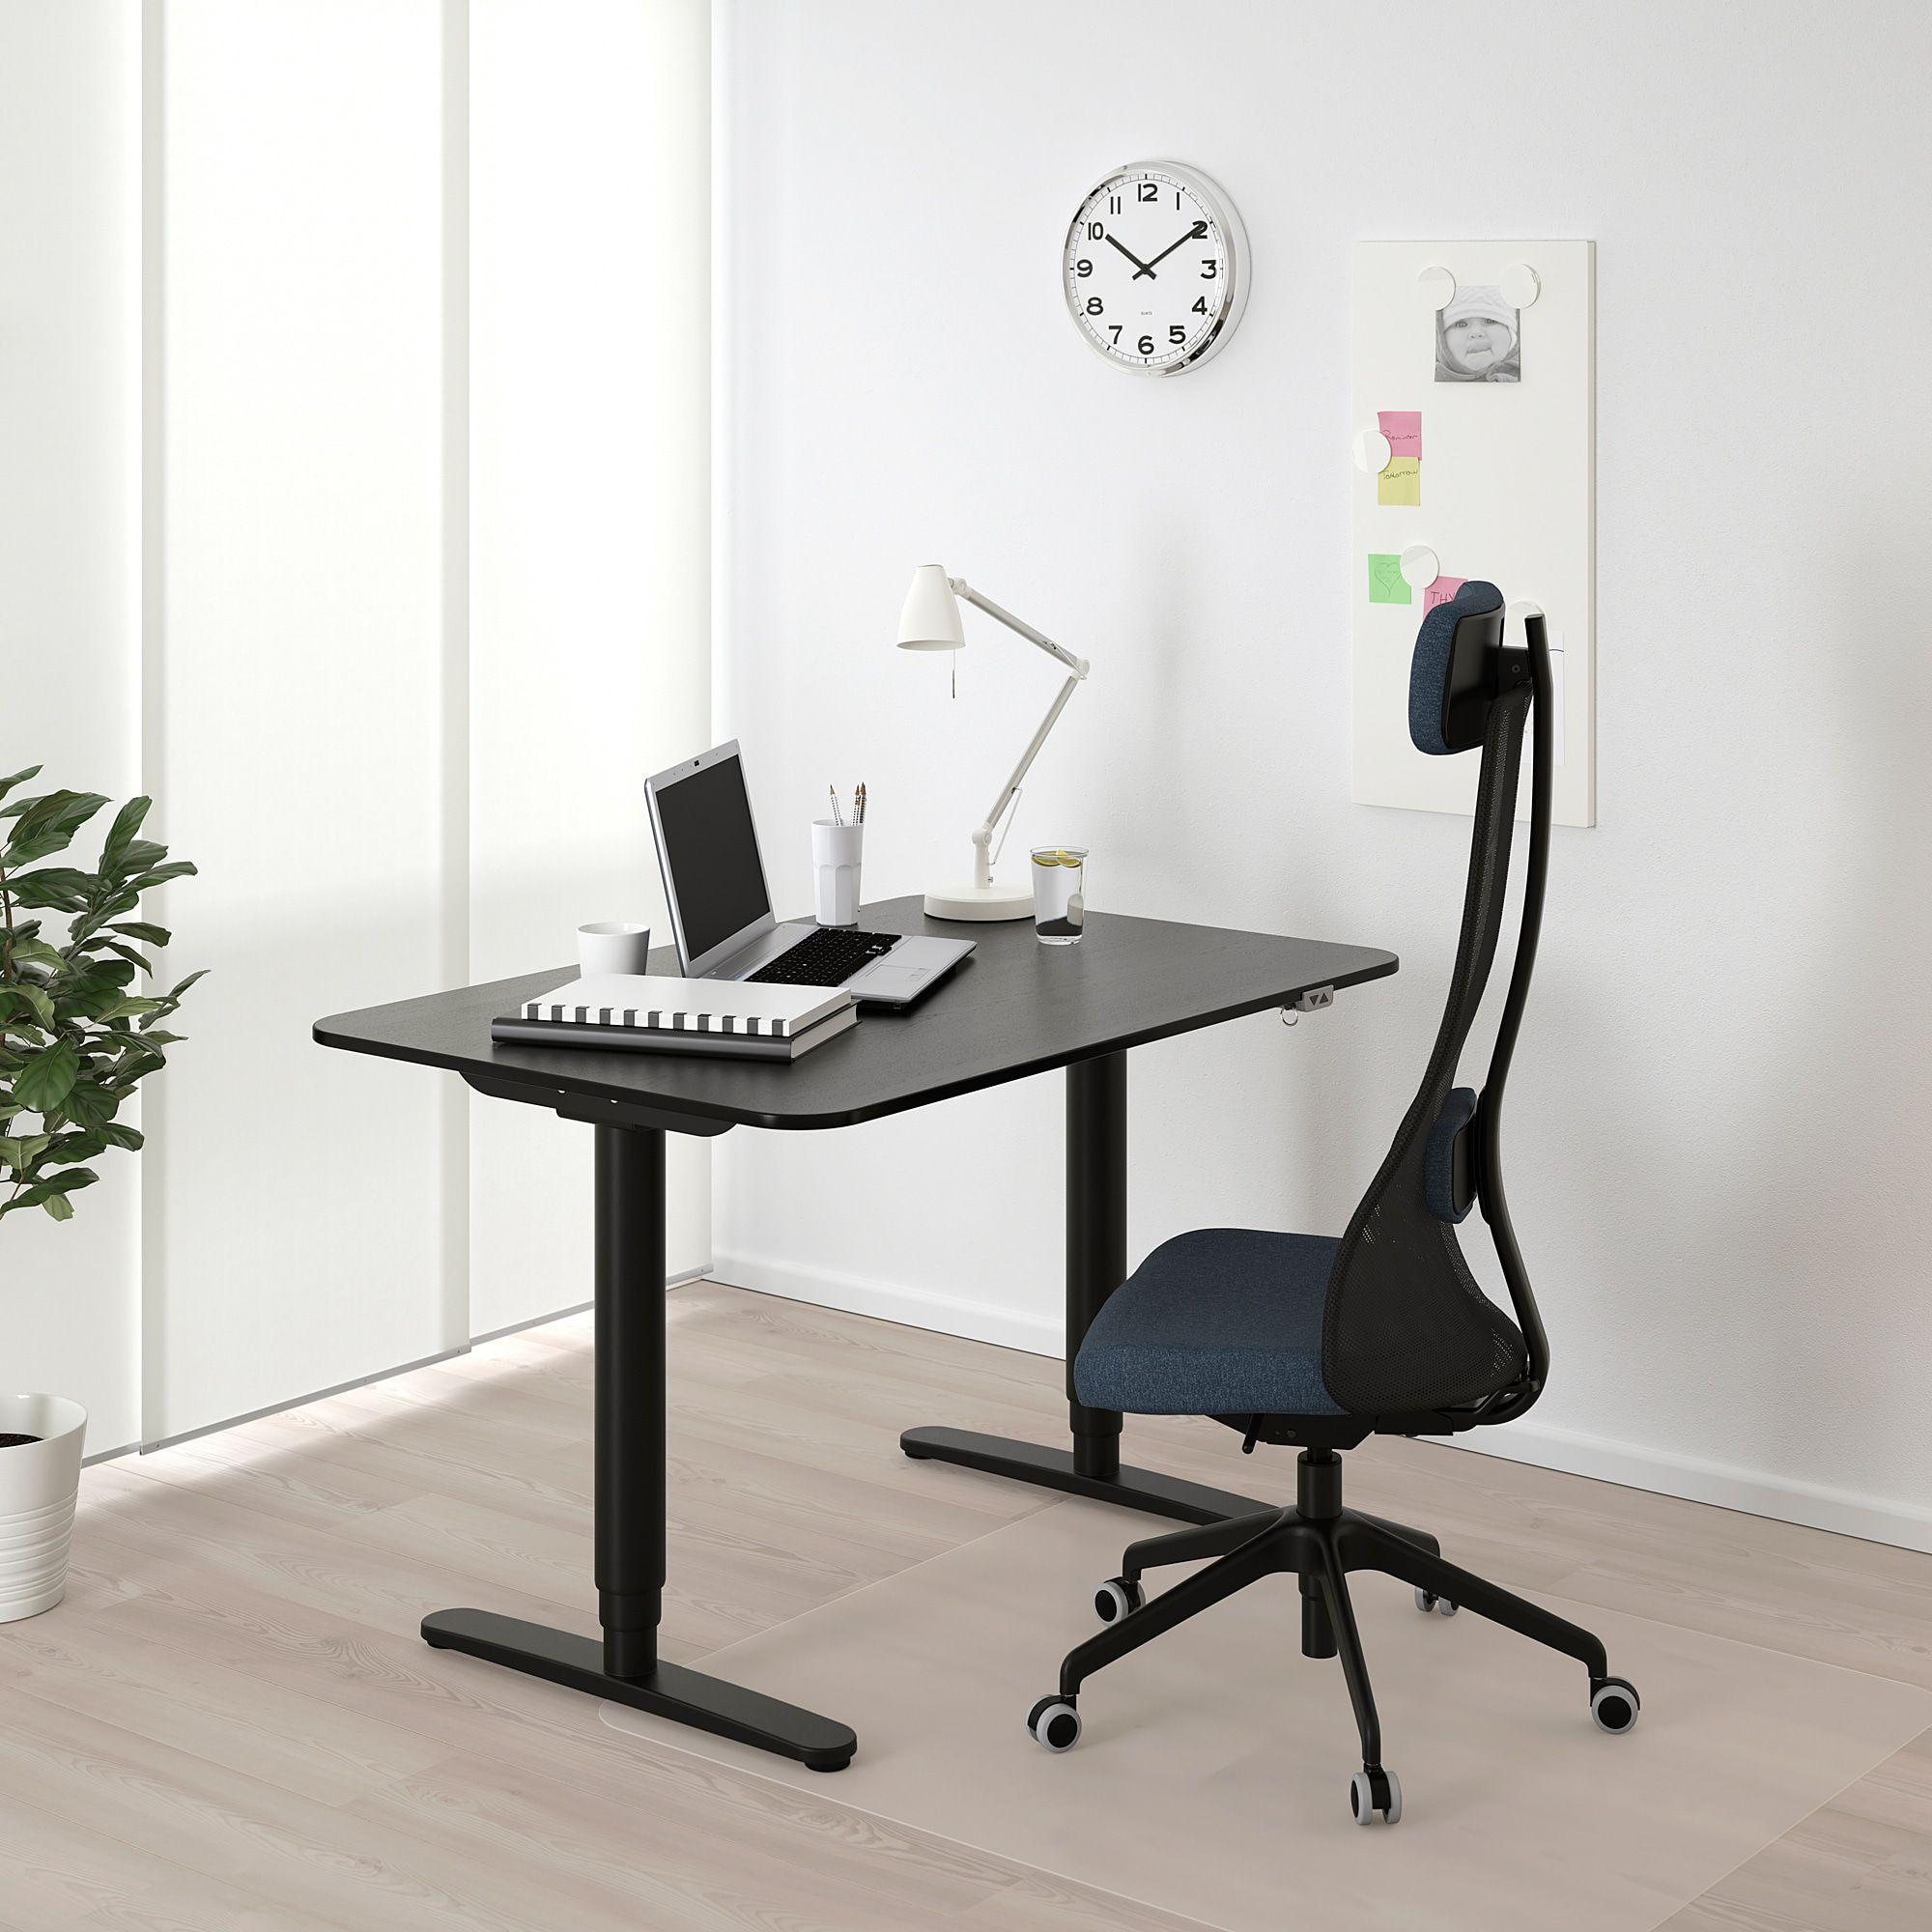 Bekant Desk Sit Stand Black Stained Ash Veneer Black 47 1 4x31 1 2 Ikea In 2020 Ikea Bekant Ikea Adjustable Height Desk